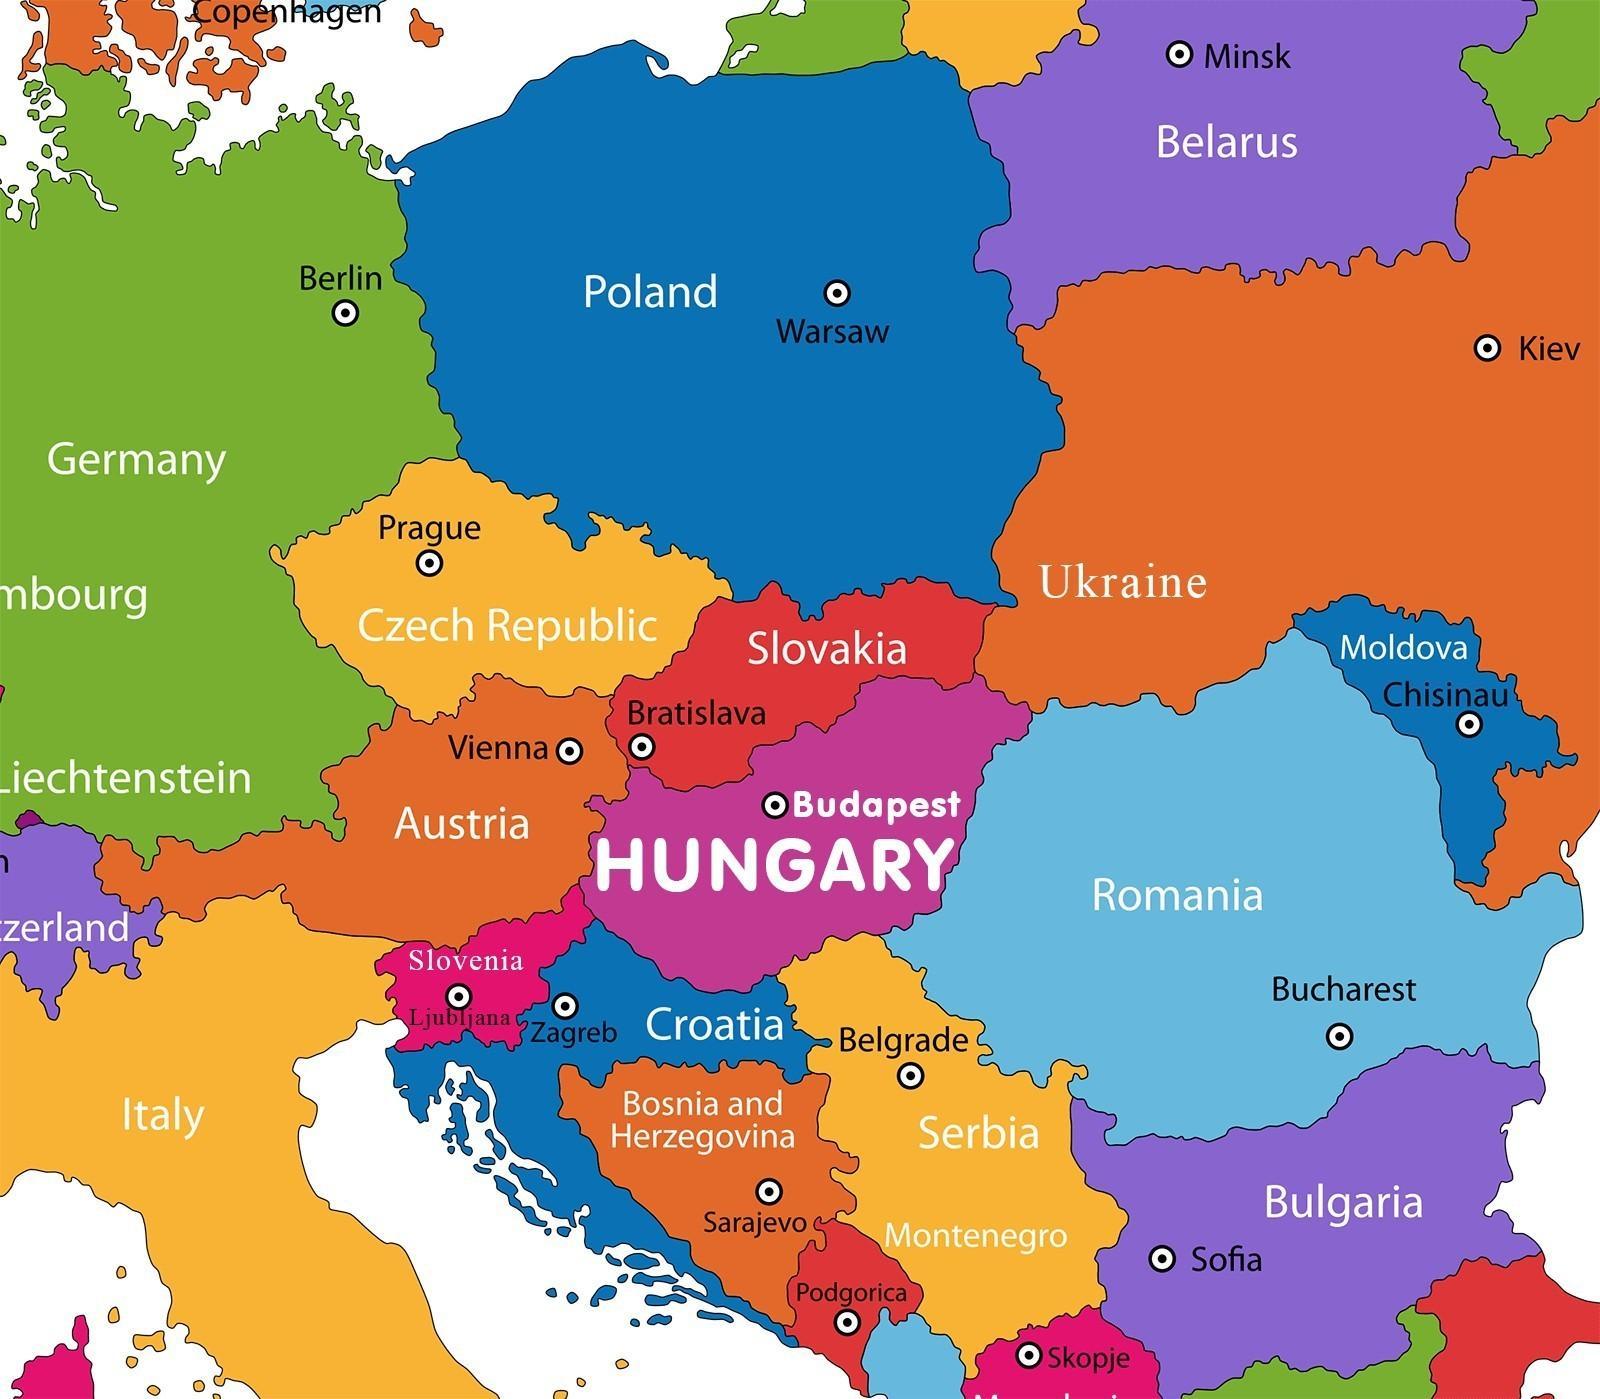 Karta Varlden Europa.Osterrike Pa Varldskartan Osterrike Karta I Varlden Karta Vastra